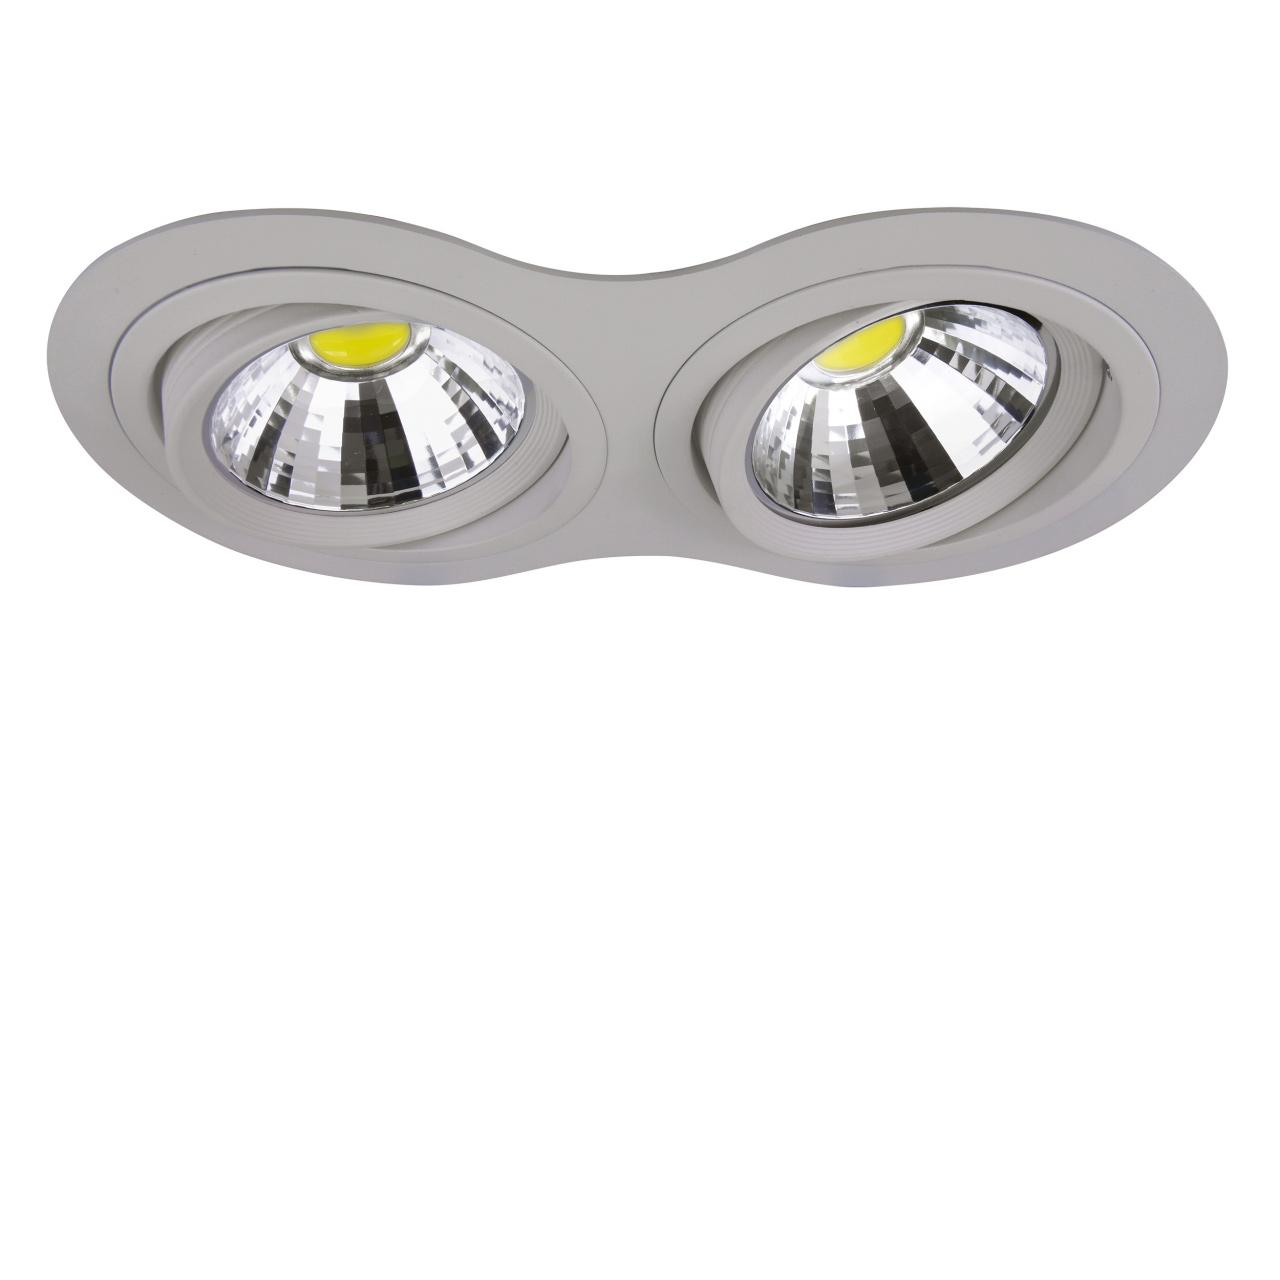 Светильник Intero 111 AR111 серый Lightstar 214329